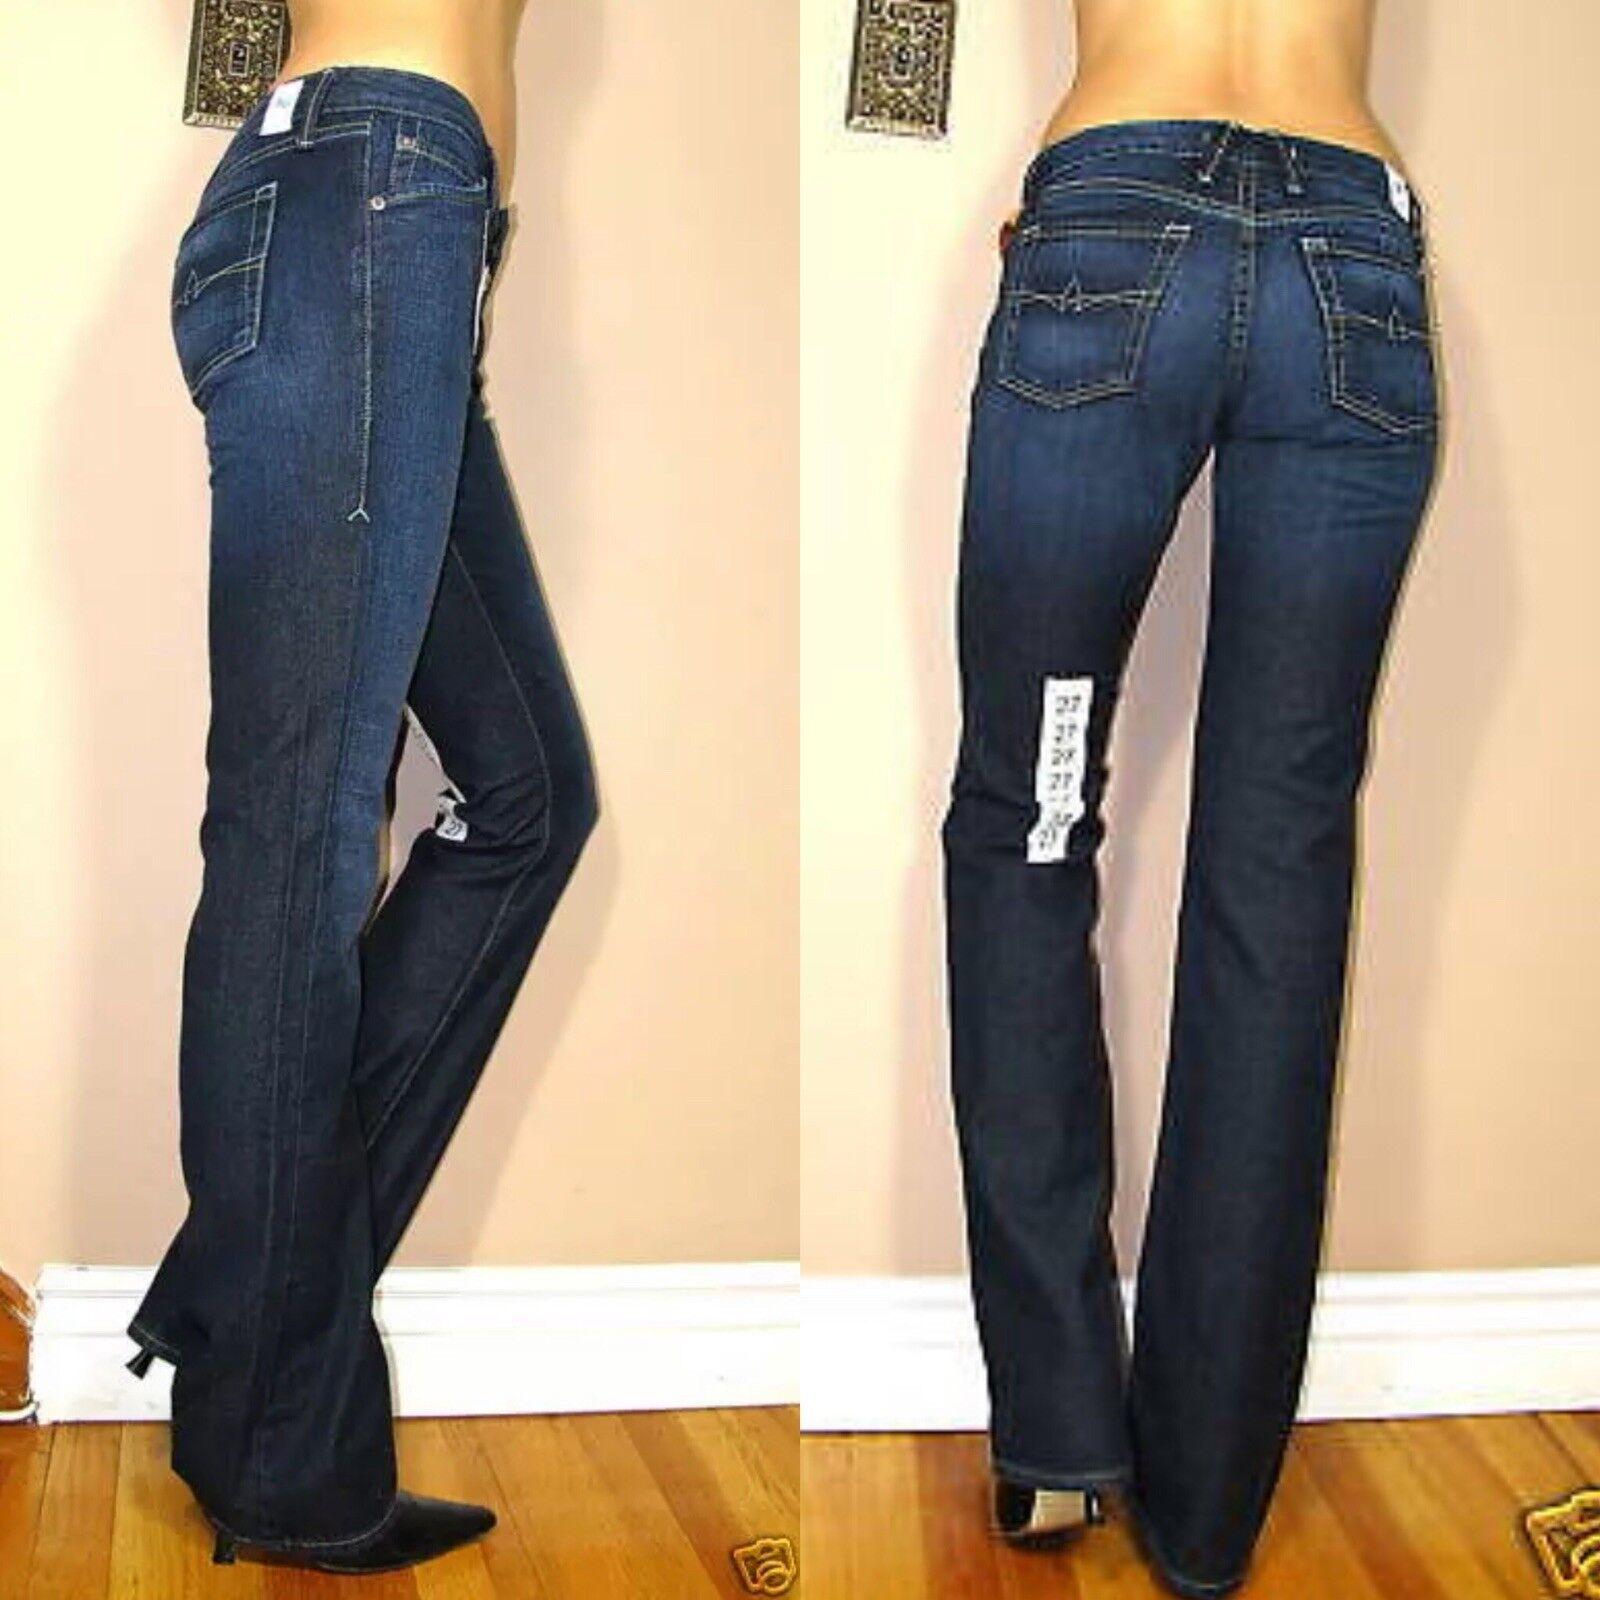 225 Agave Sirena Slim Bootcut in Beverly Hills Cashmere X-Soft Dark Jeans 25